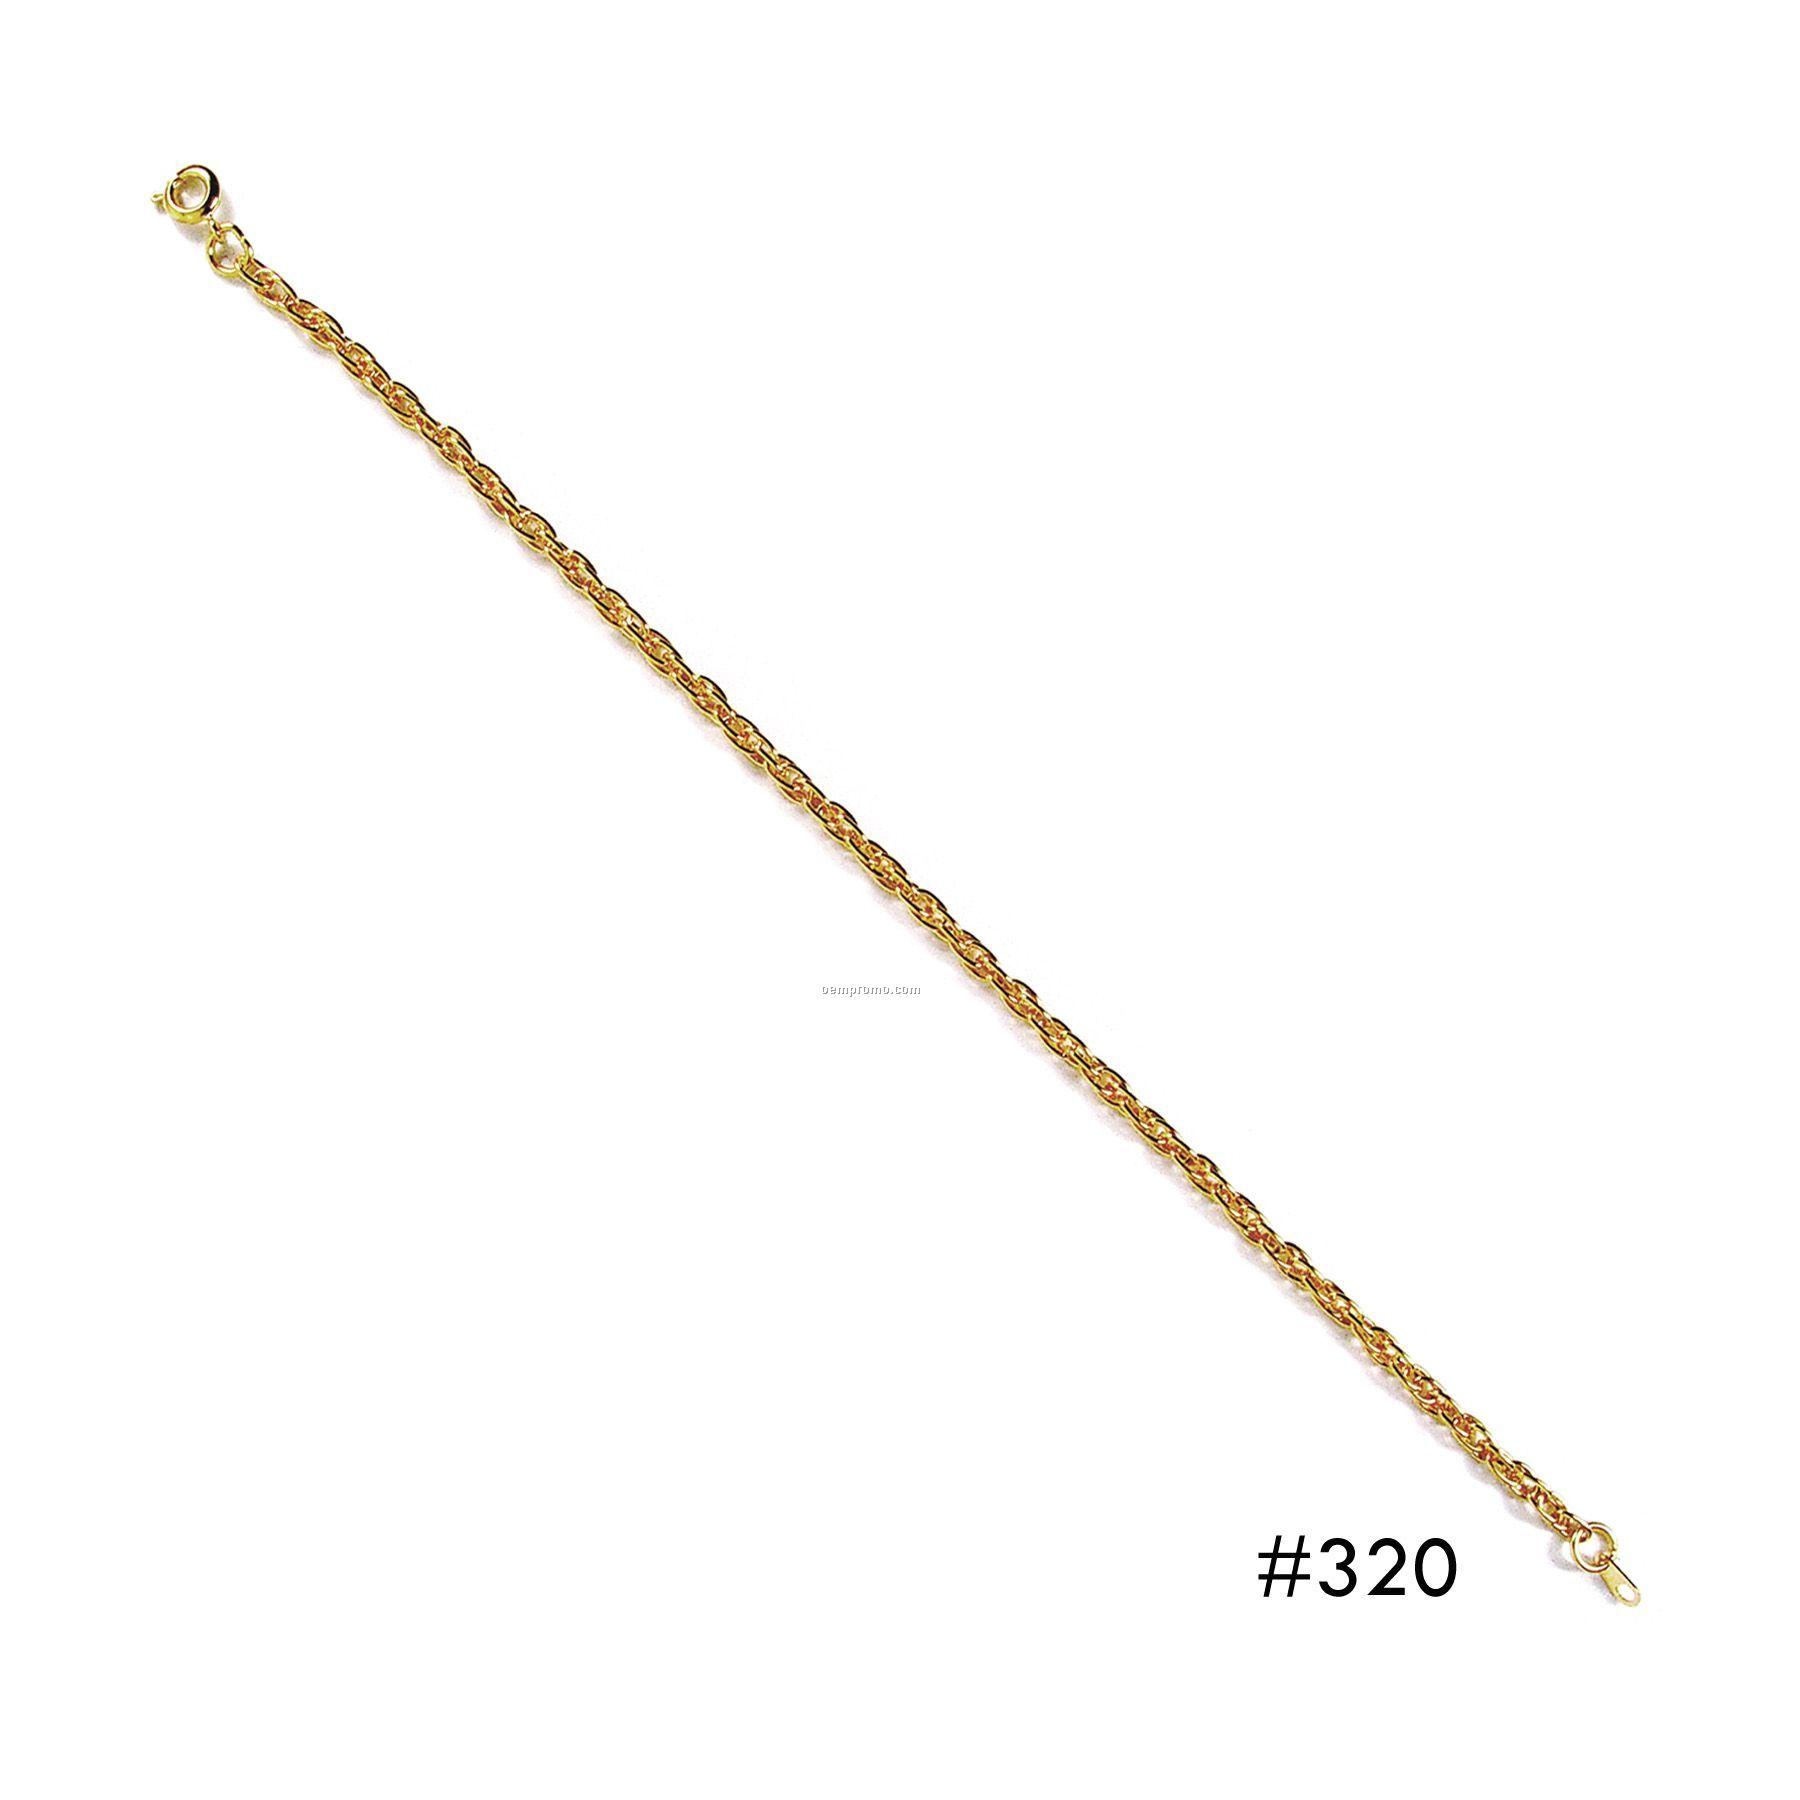 Gold Charm Bracelet - Small Link